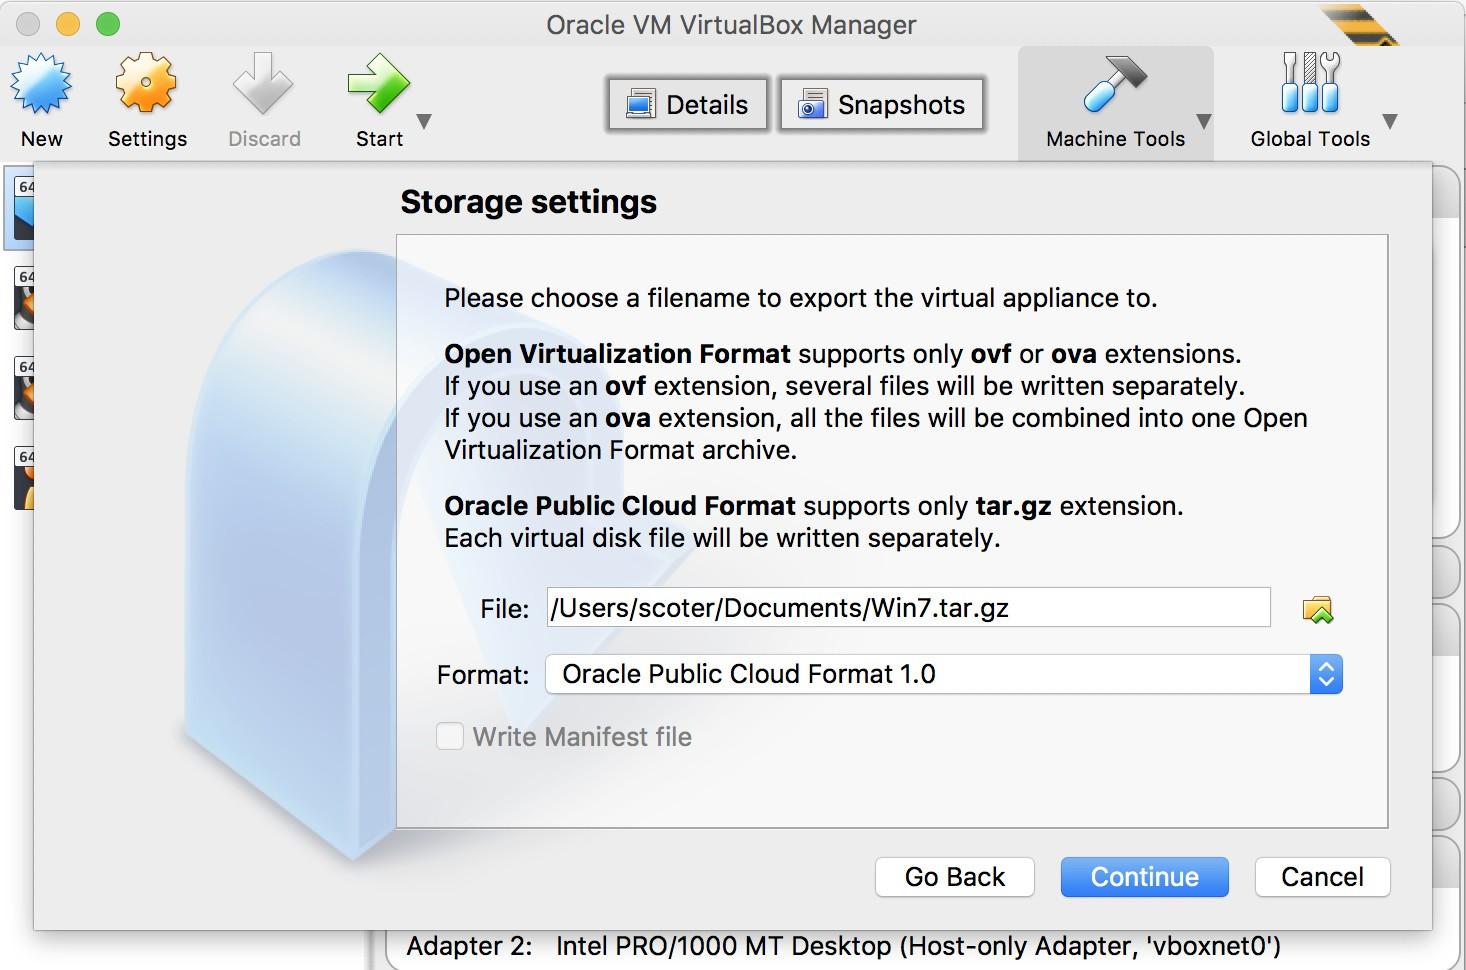 virtualbox 5 2 to let users export vms to oracle public cloud add rh news softpedia com oracle vm virtualbox user manual pdf oracle vm virtualbox user manual español